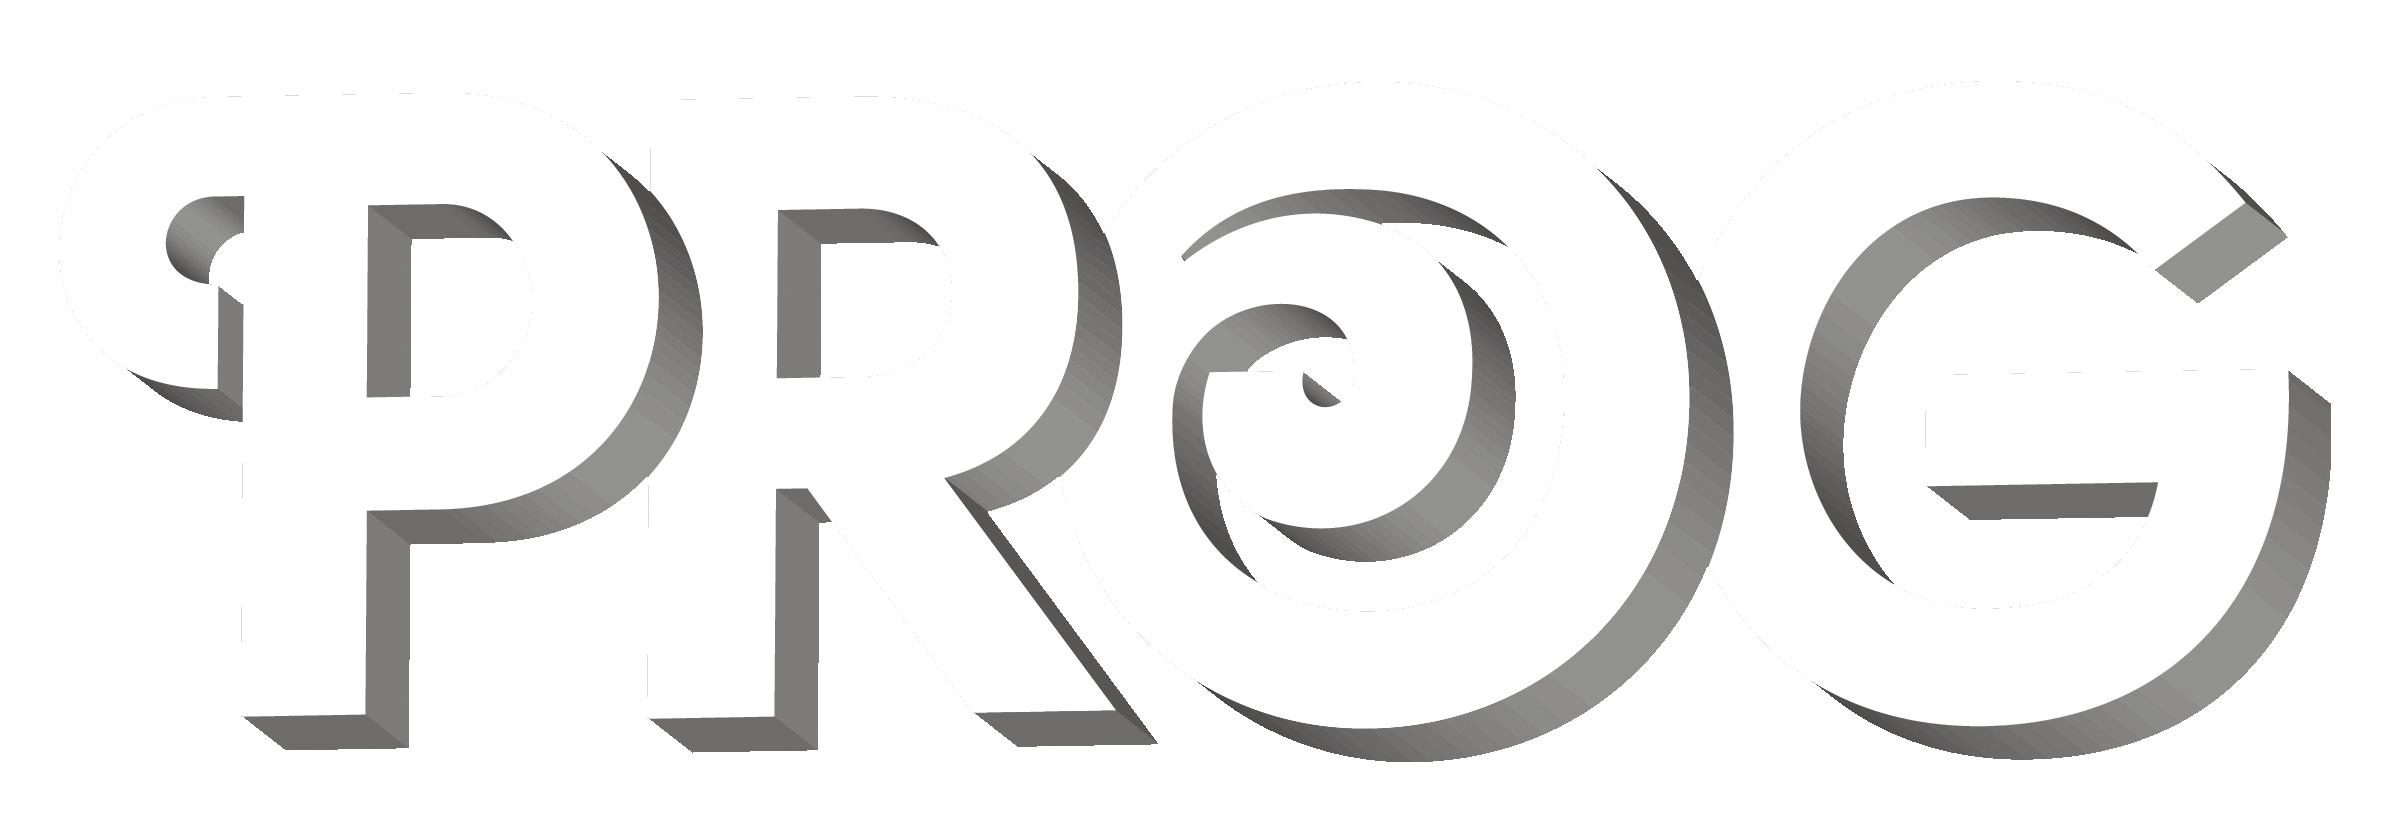 Prog Magazine logo (3D version)